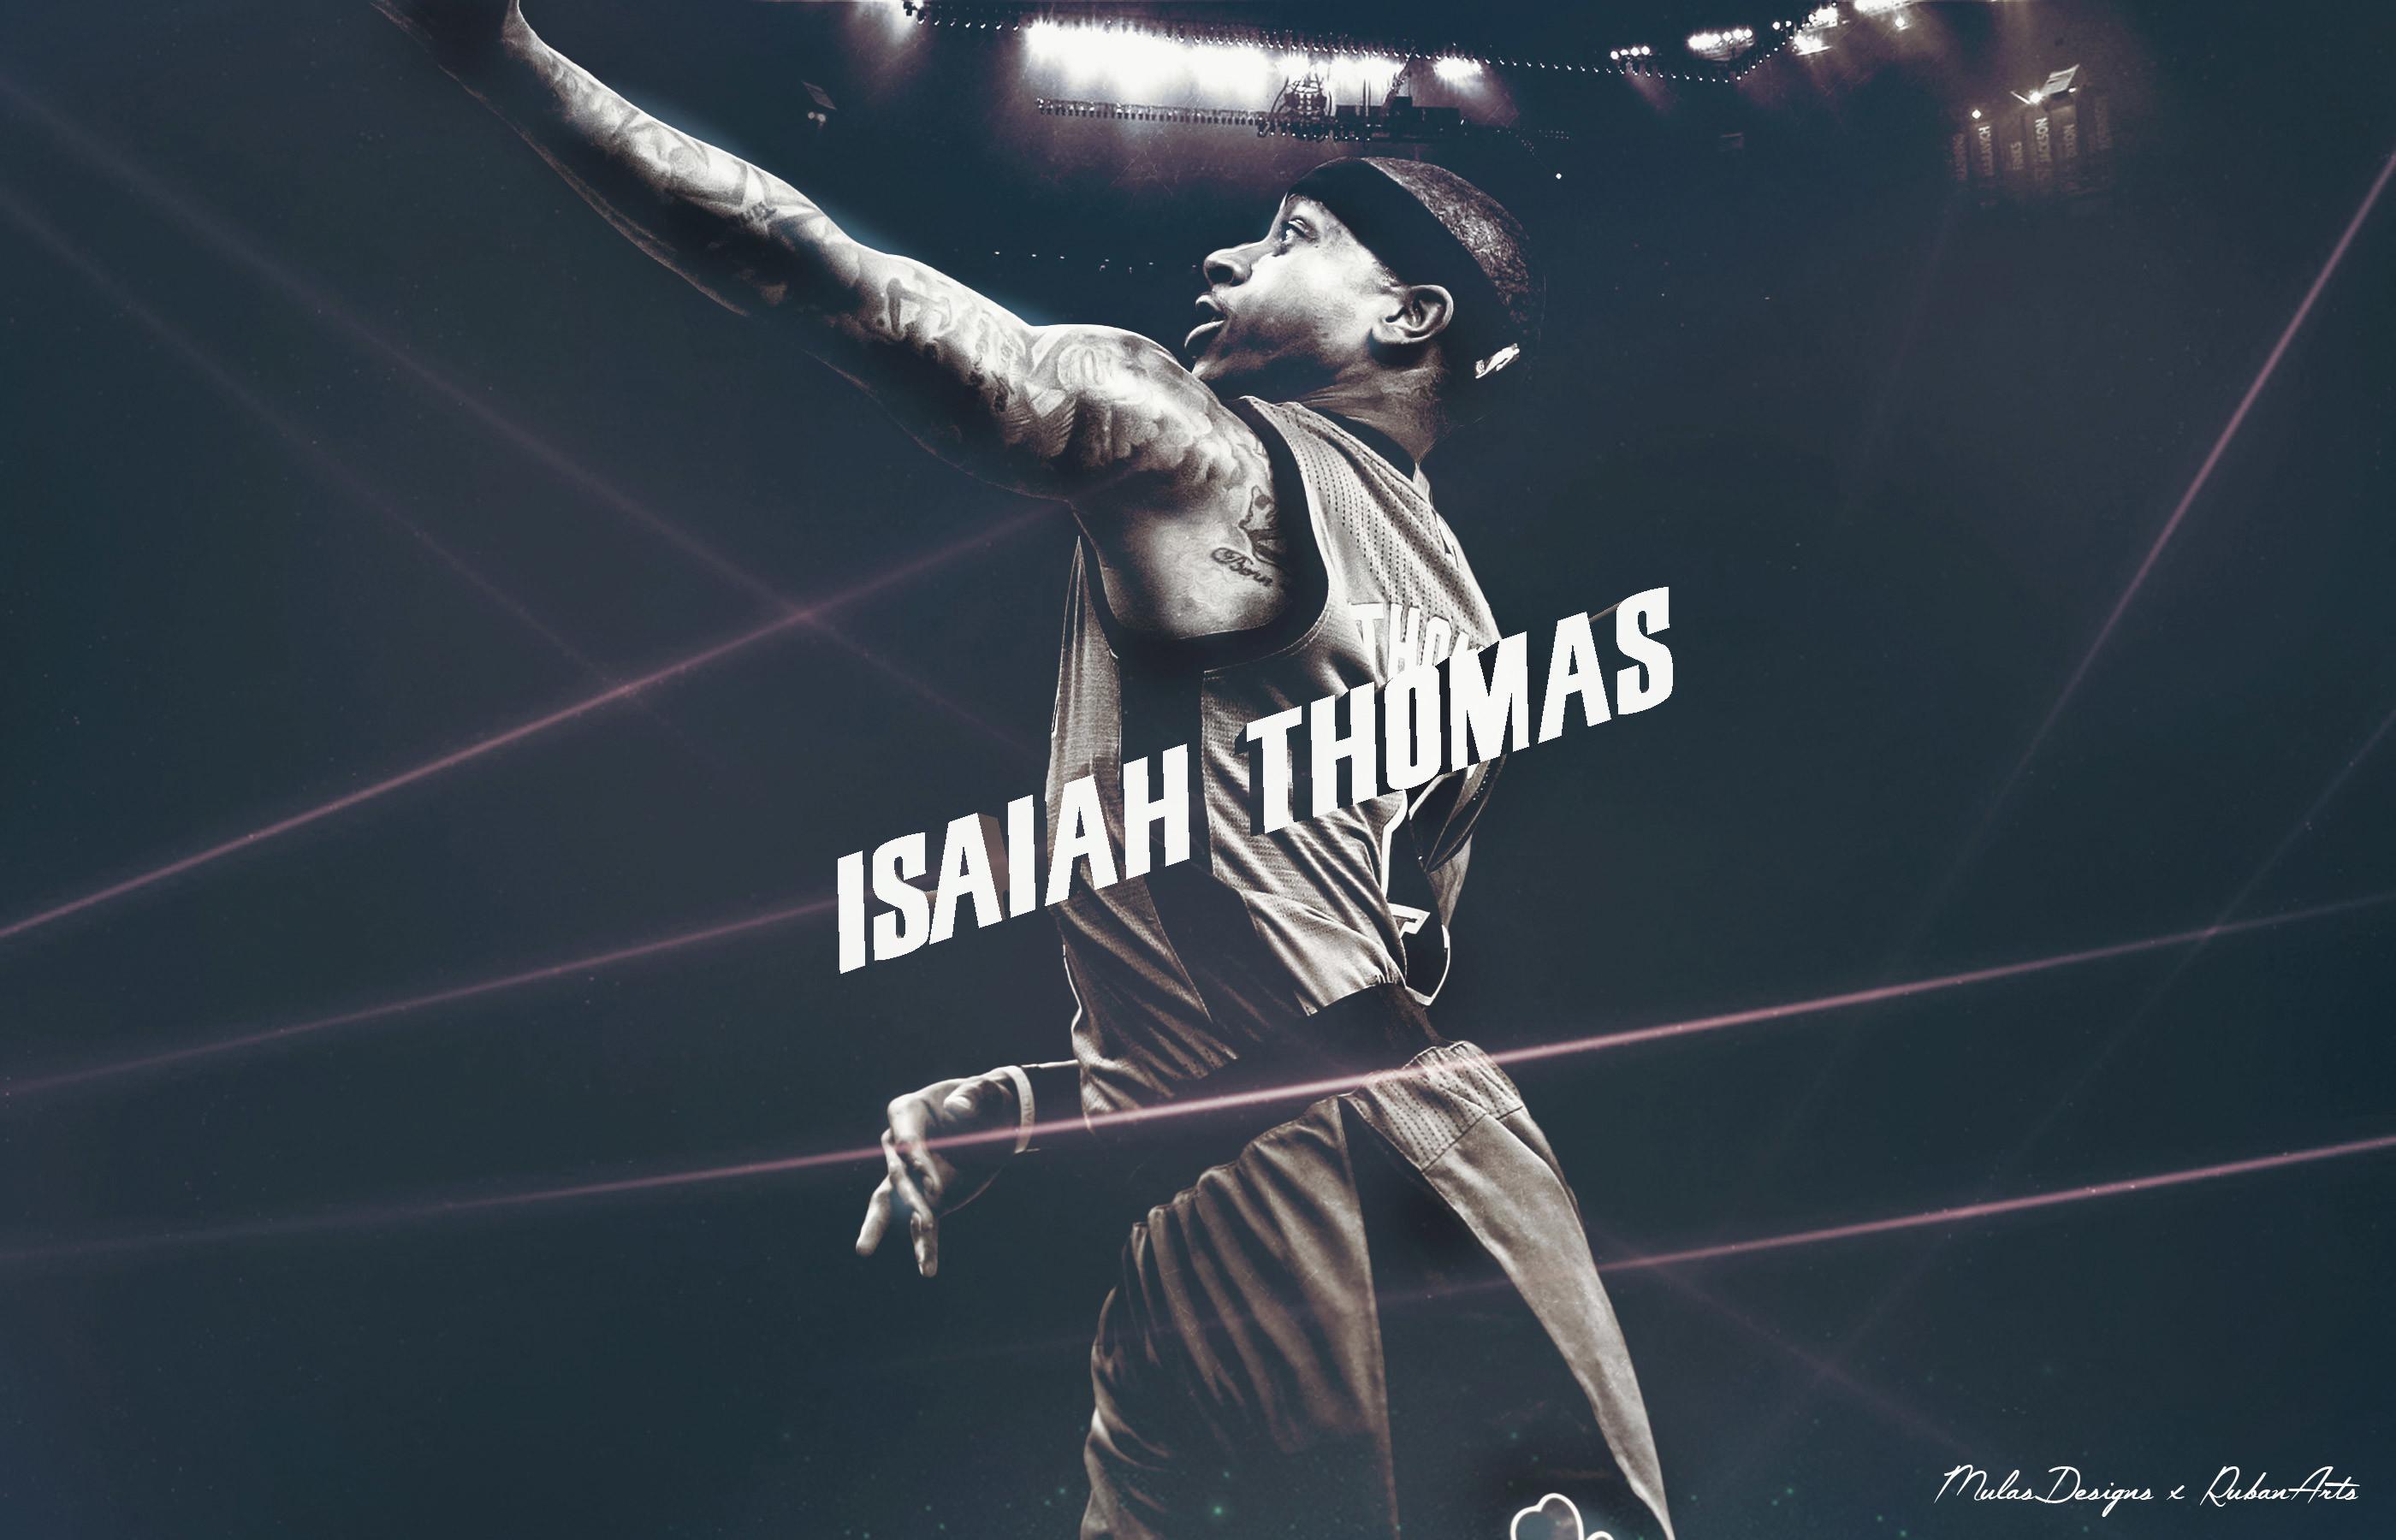 2800x1800 Isaiah Thomas Boston Celtics 2016 2880x1800 Wallpaper